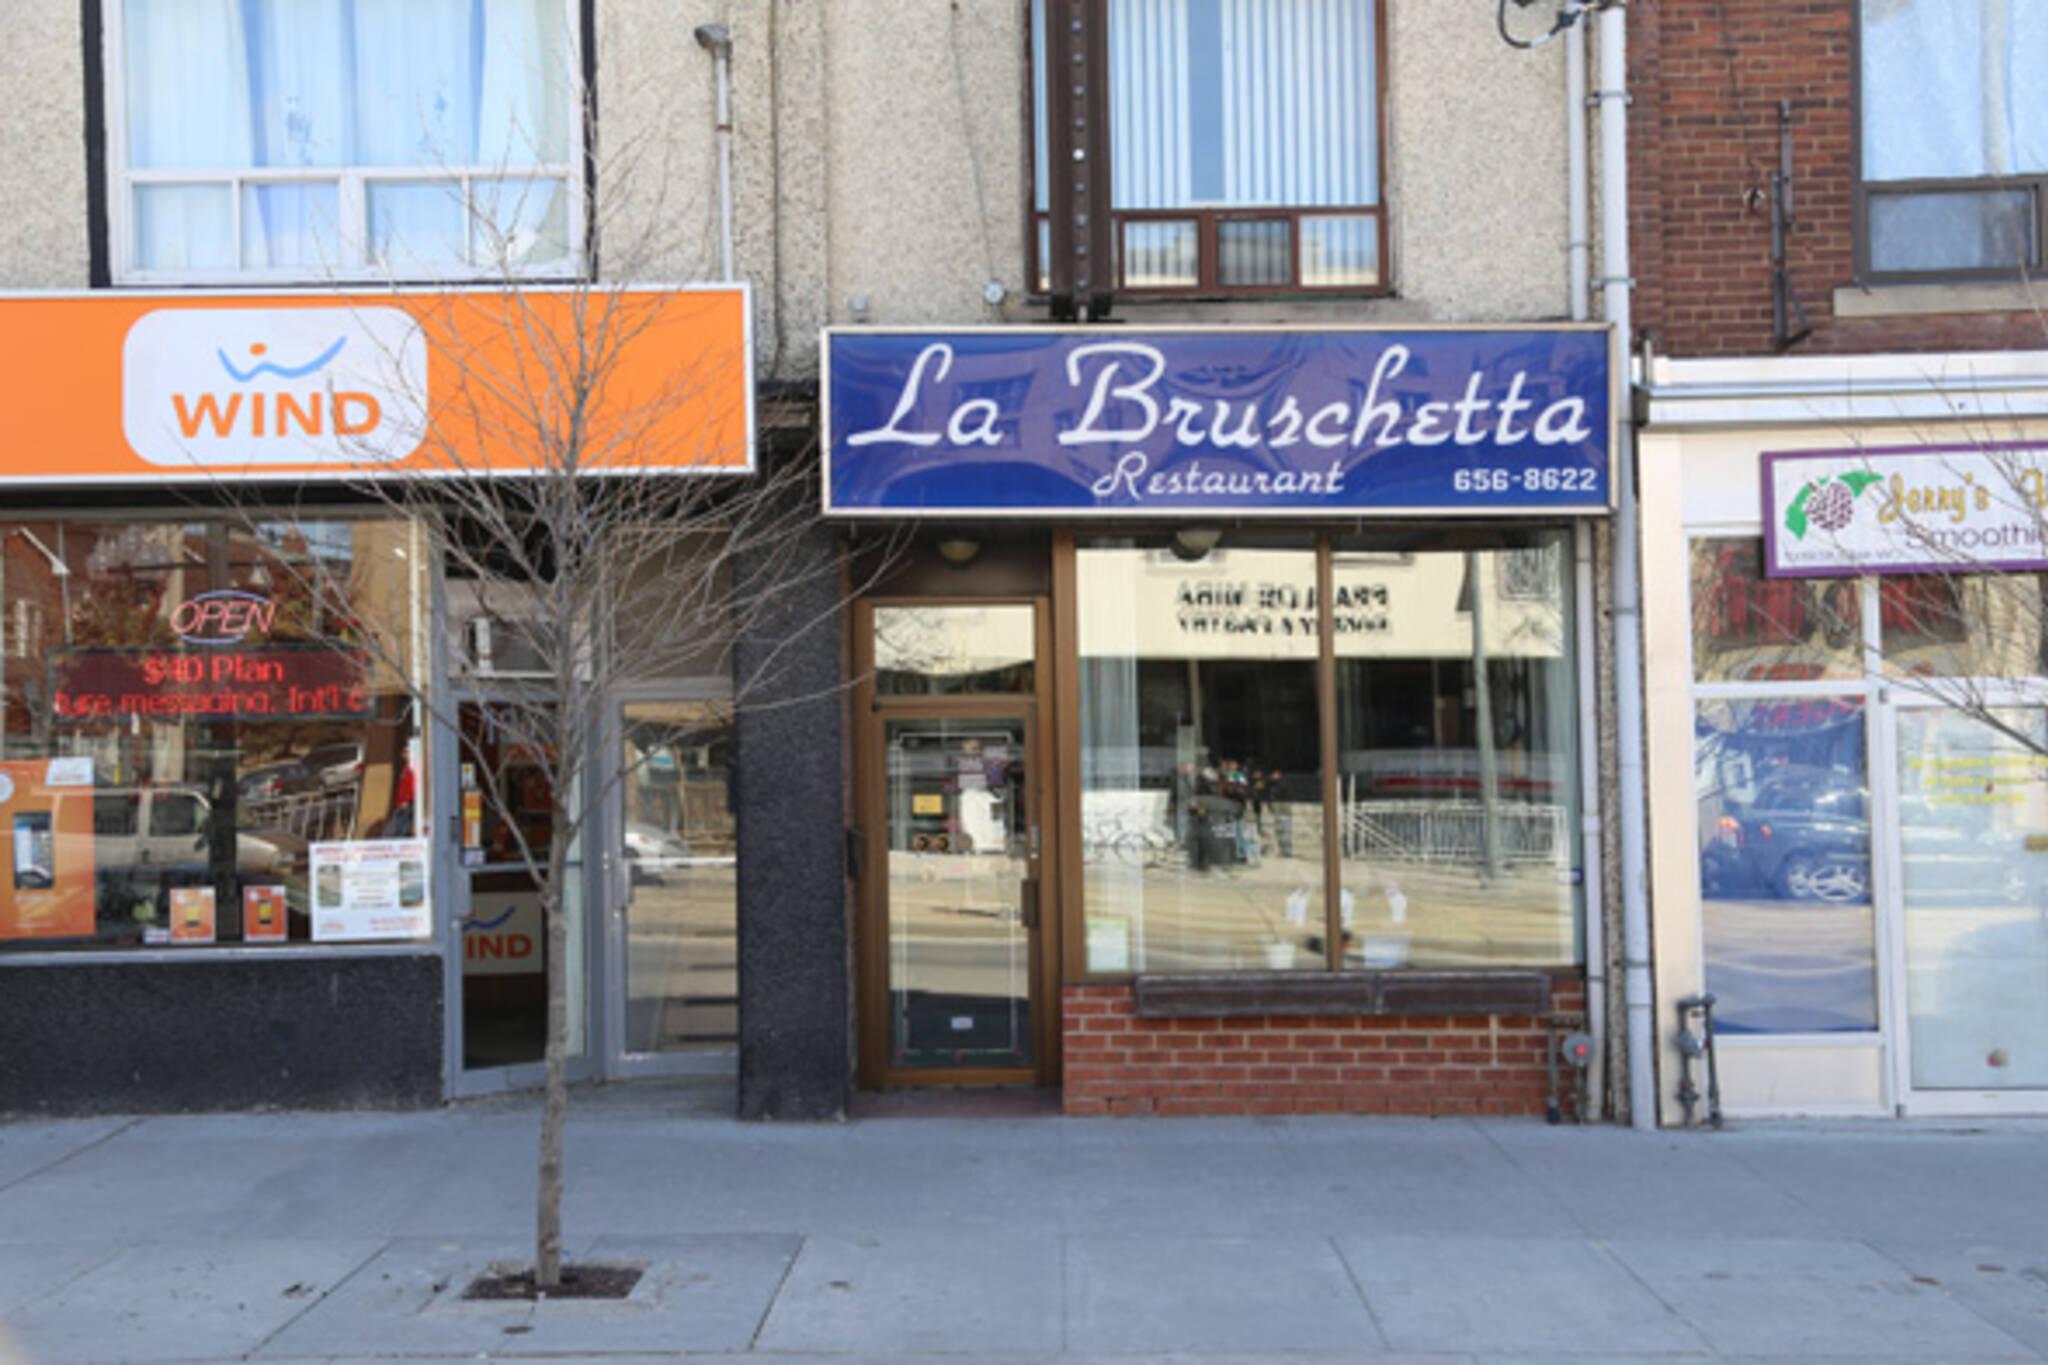 La Bruschetta Toronto